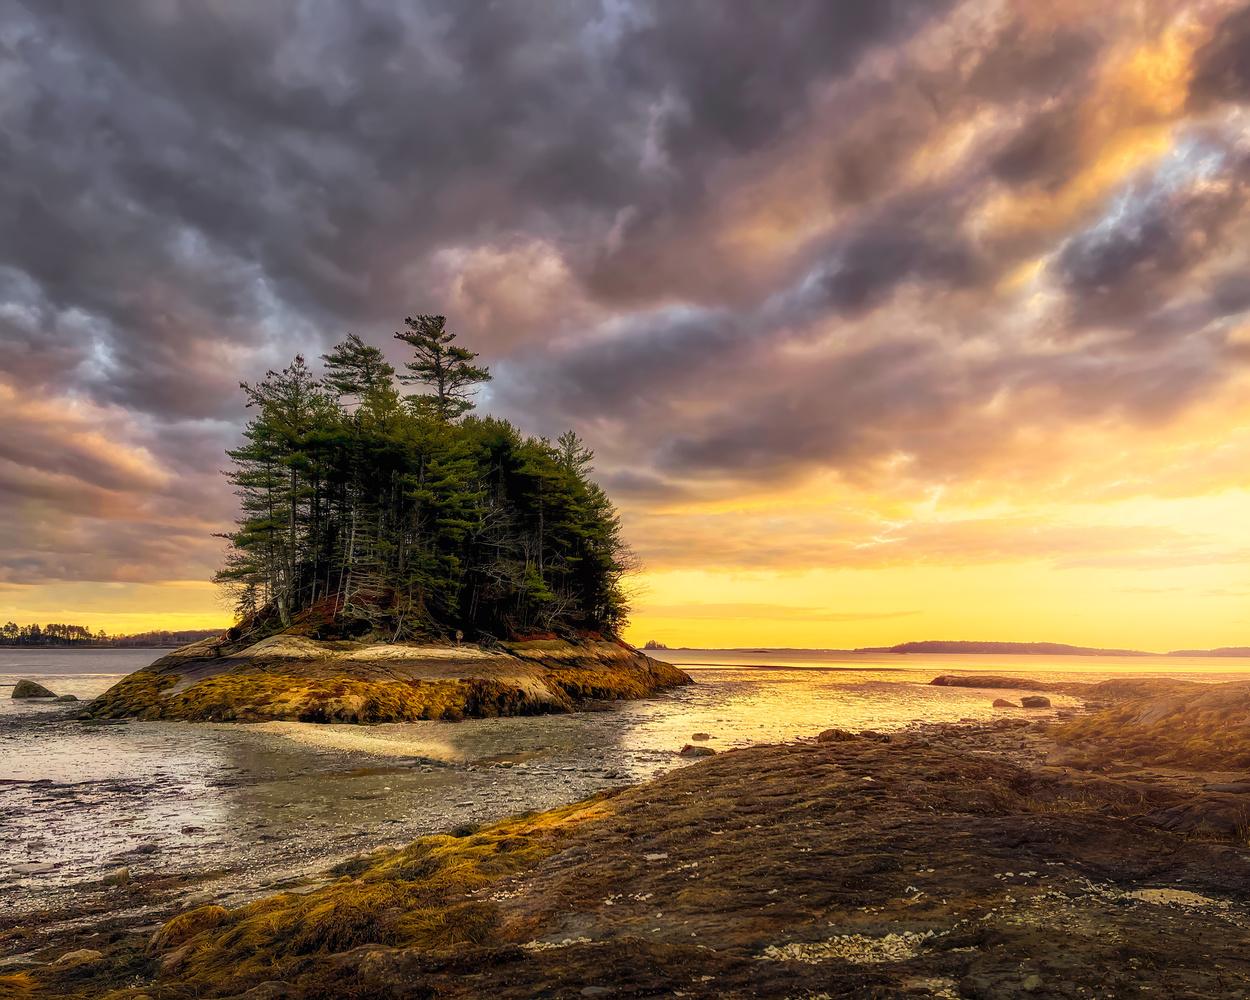 Wolfs neck, Maine by Skyler Ewing